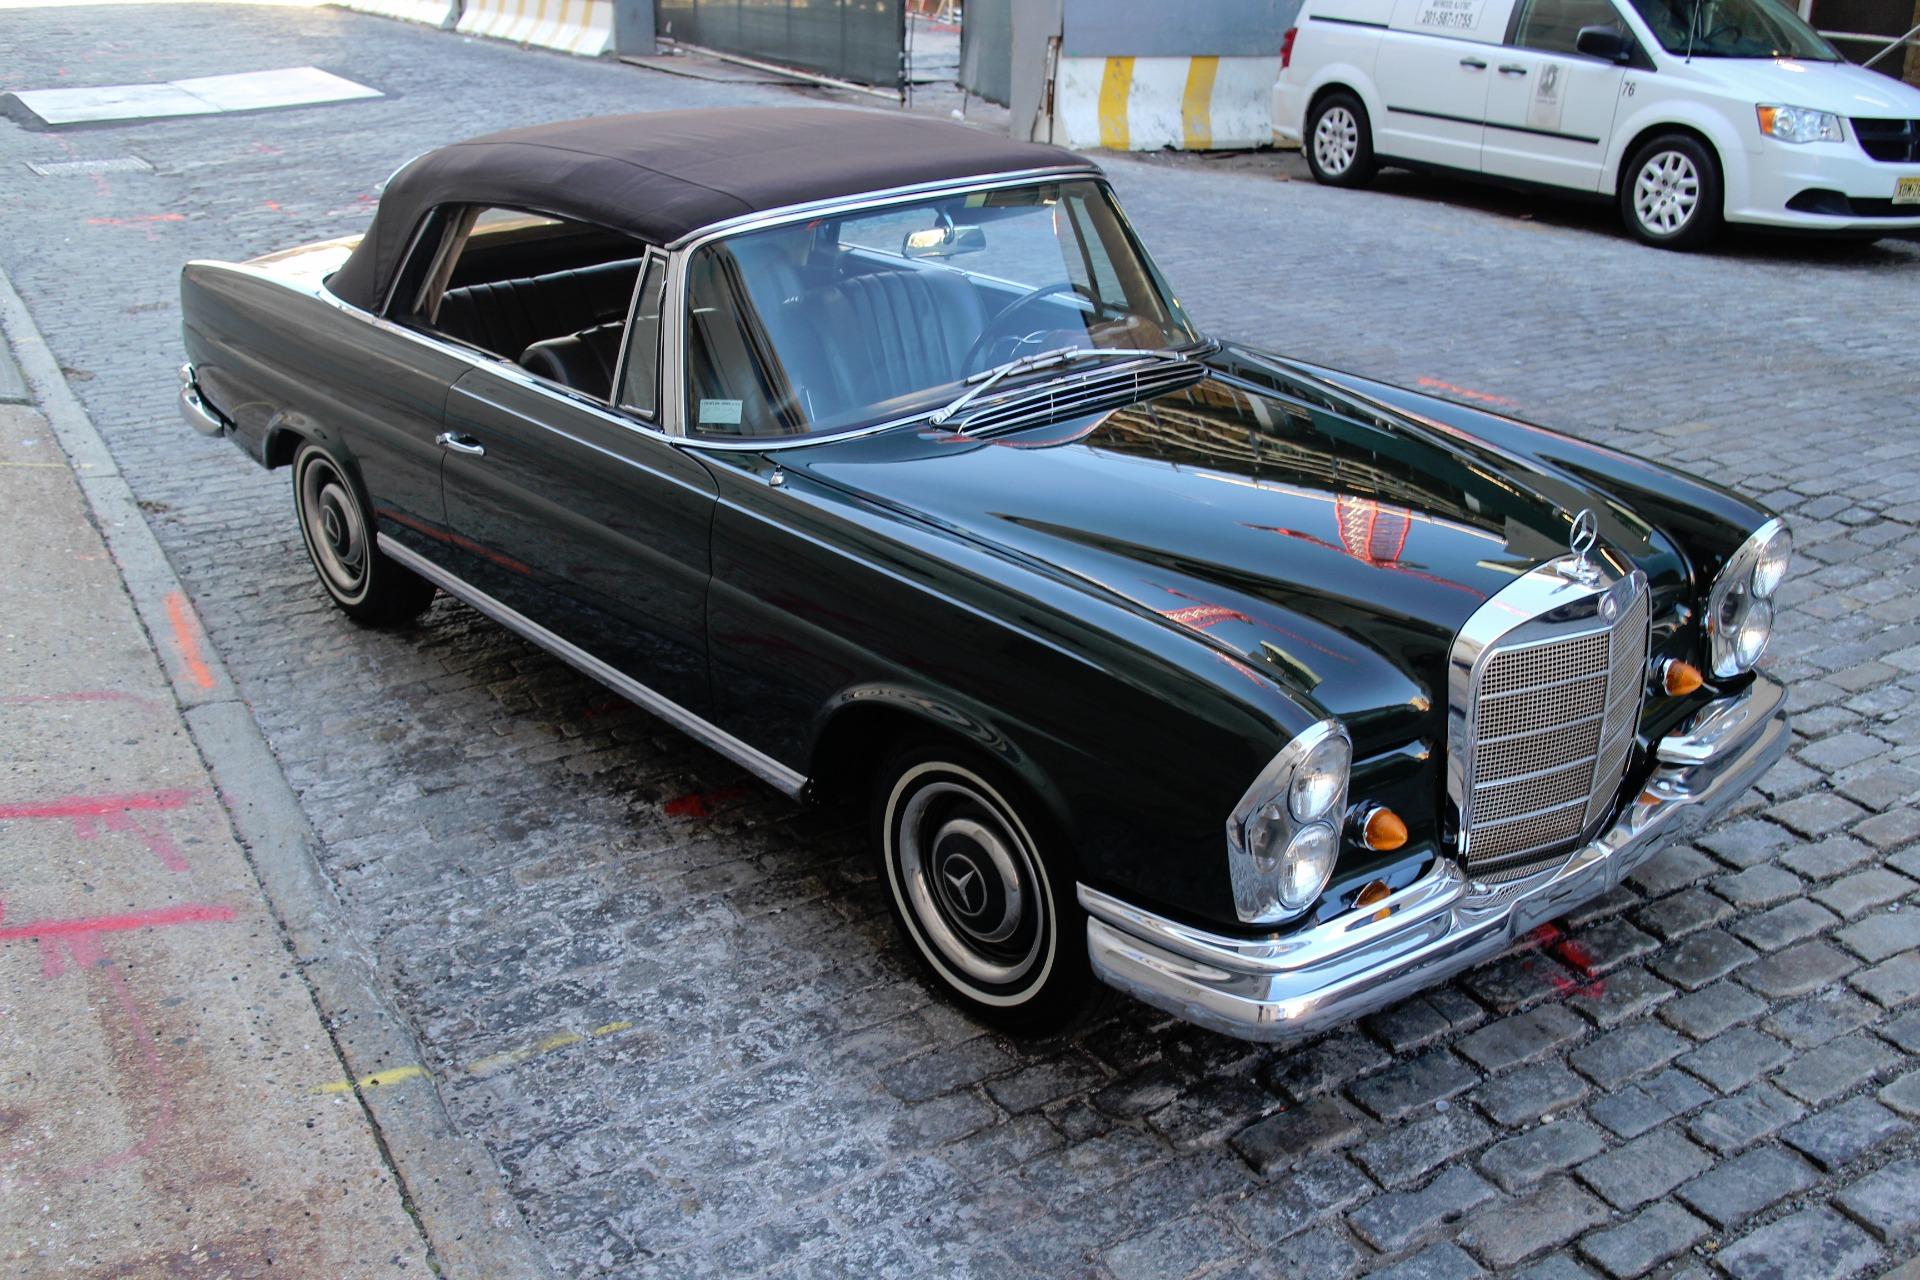 Used Cars Atlanta Ga >> 1967 Mercedes-Benz 250 SE Stock # 67250SL for sale near ...